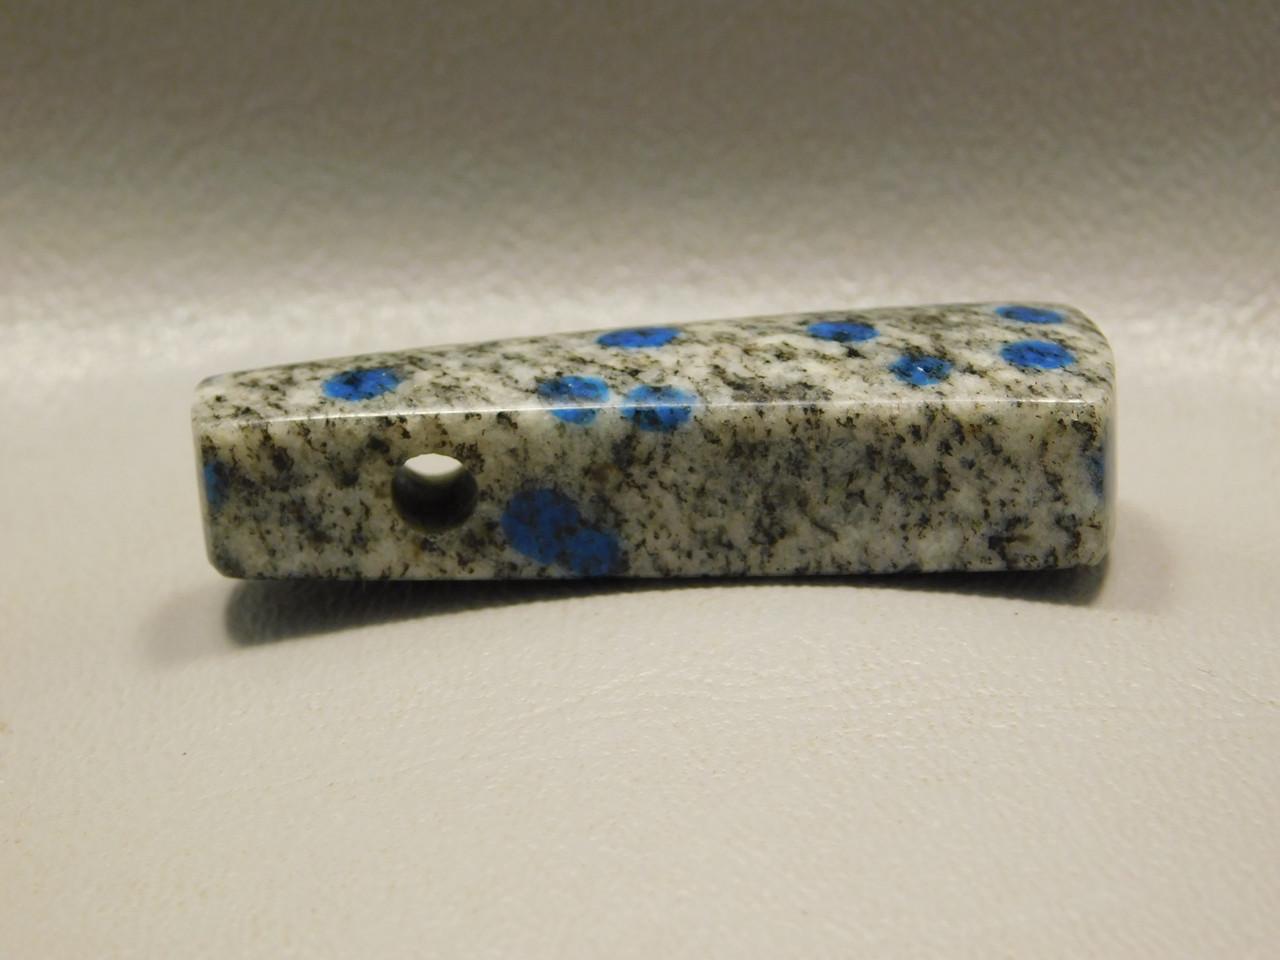 K2 Azurite Granite Stone Bead Pendant #10